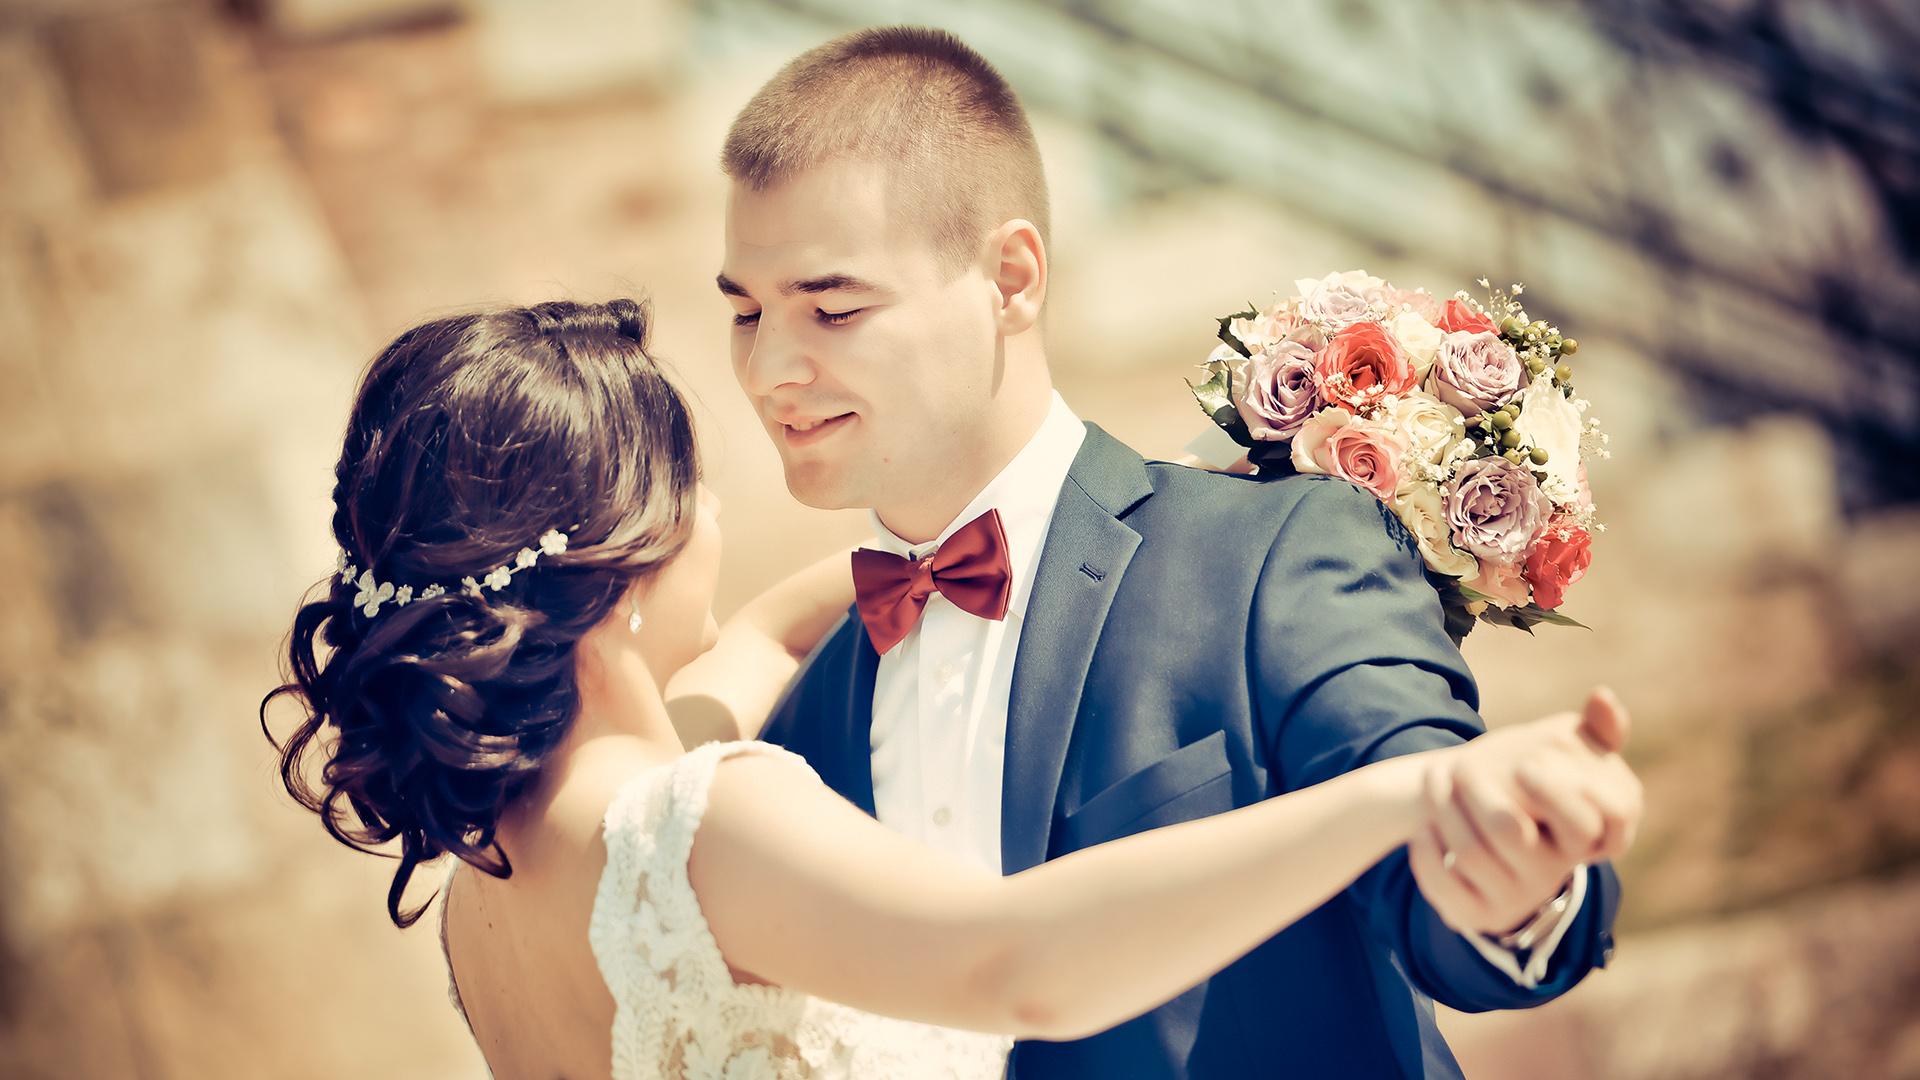 Fotografisanje-vencanja-Wedding-Photography-Hochzeitsfotografie-1-1.jpg